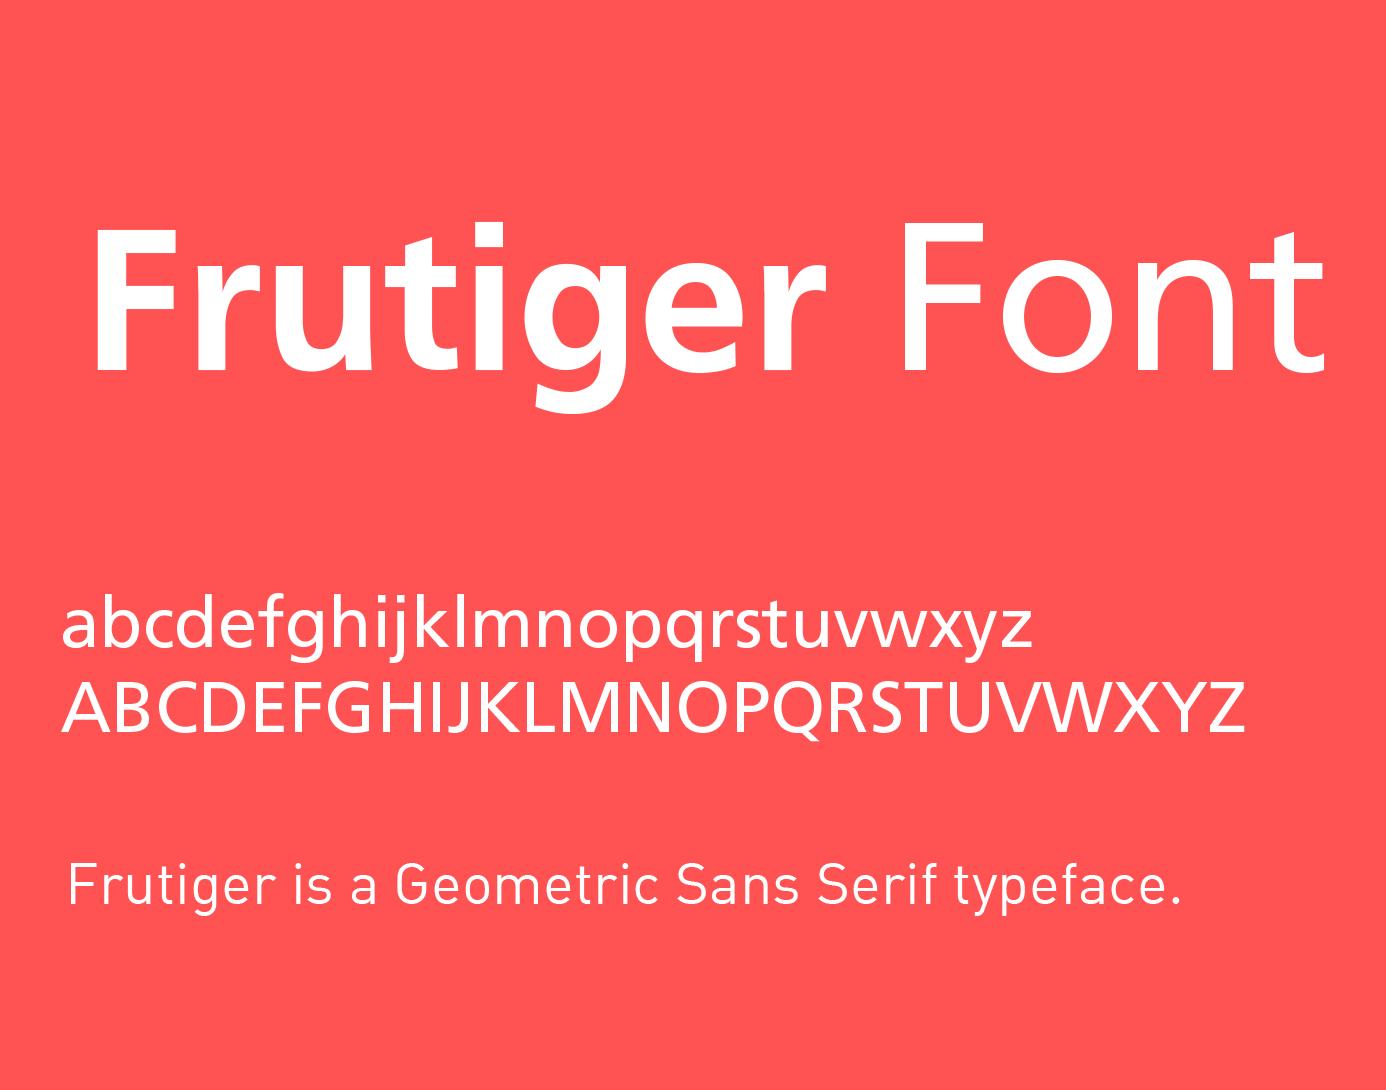 typo frutiger gratuit